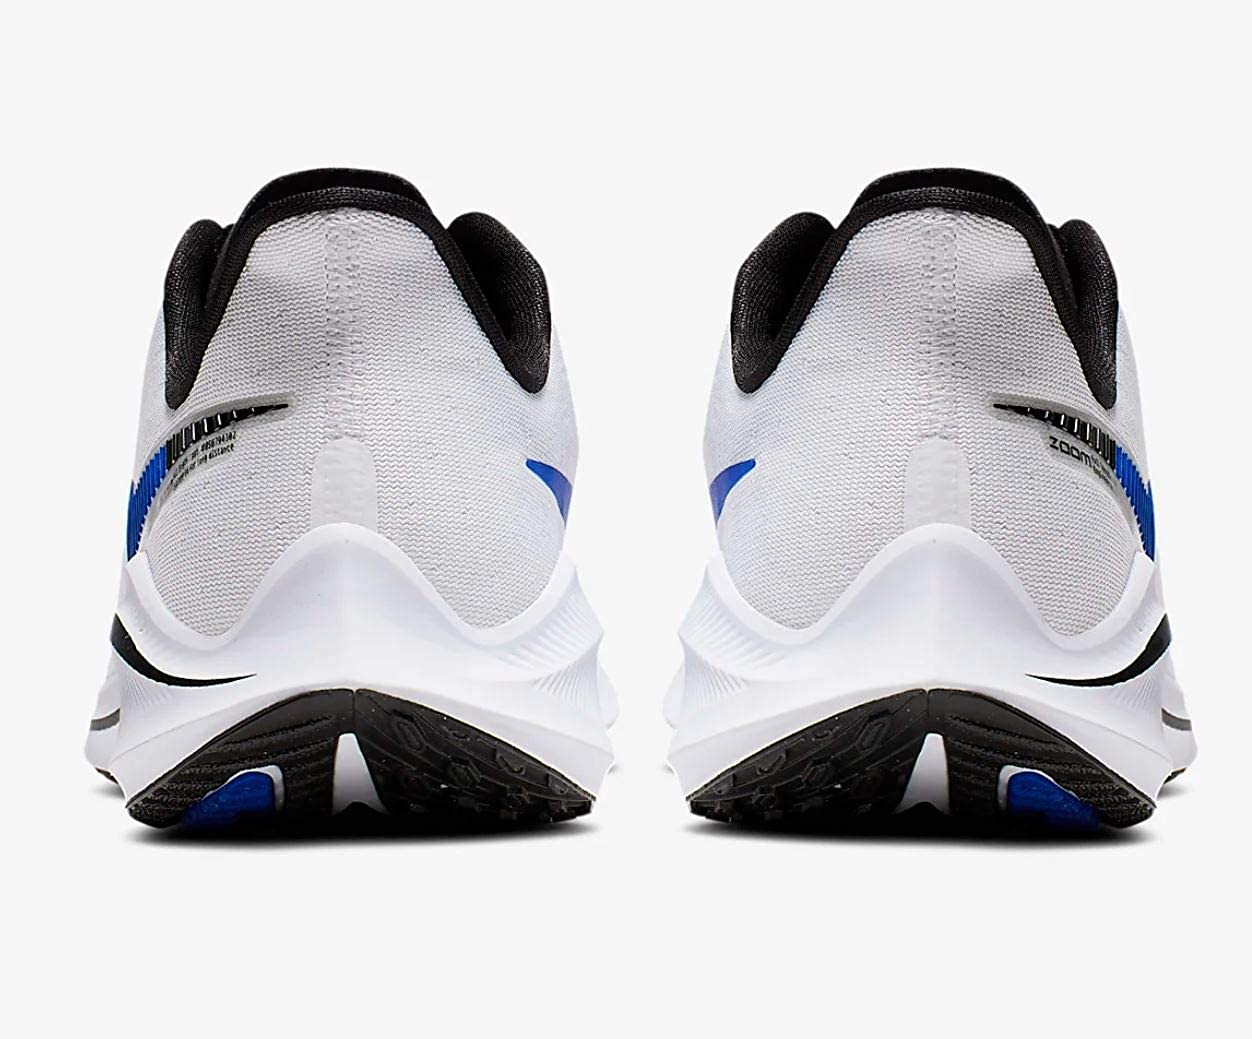 Nike Men's Running Shoes, Black, EU Multicolour Black Anthracite Mtlc Pewter Cool Grey 4